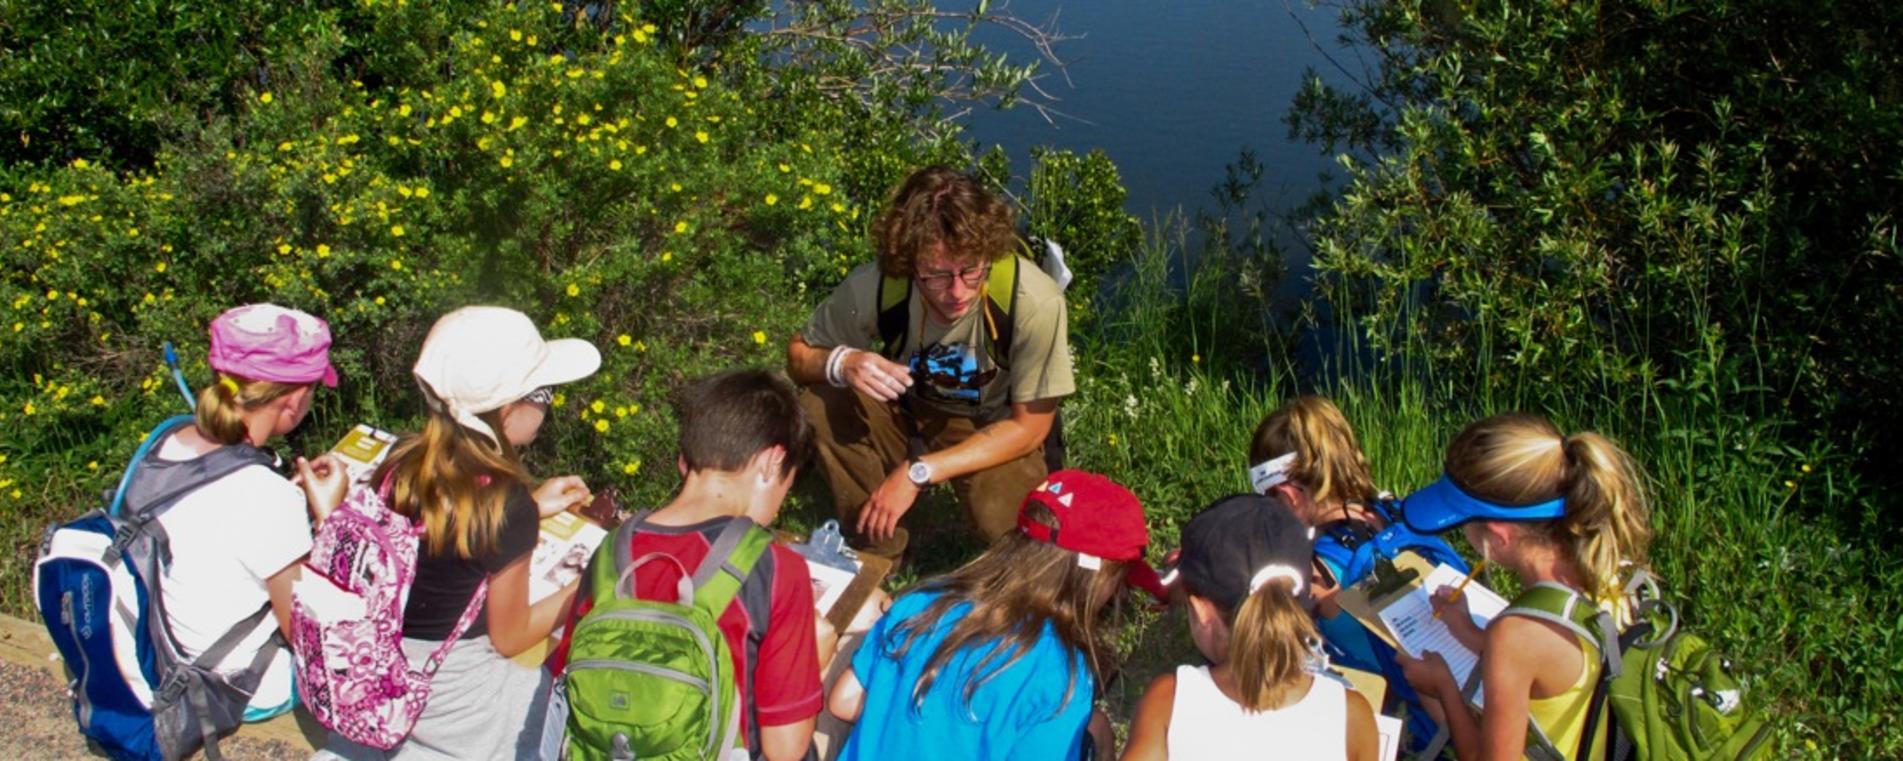 Lily Lake Nature Hunt: A Virtual Geocache Adventure - Image